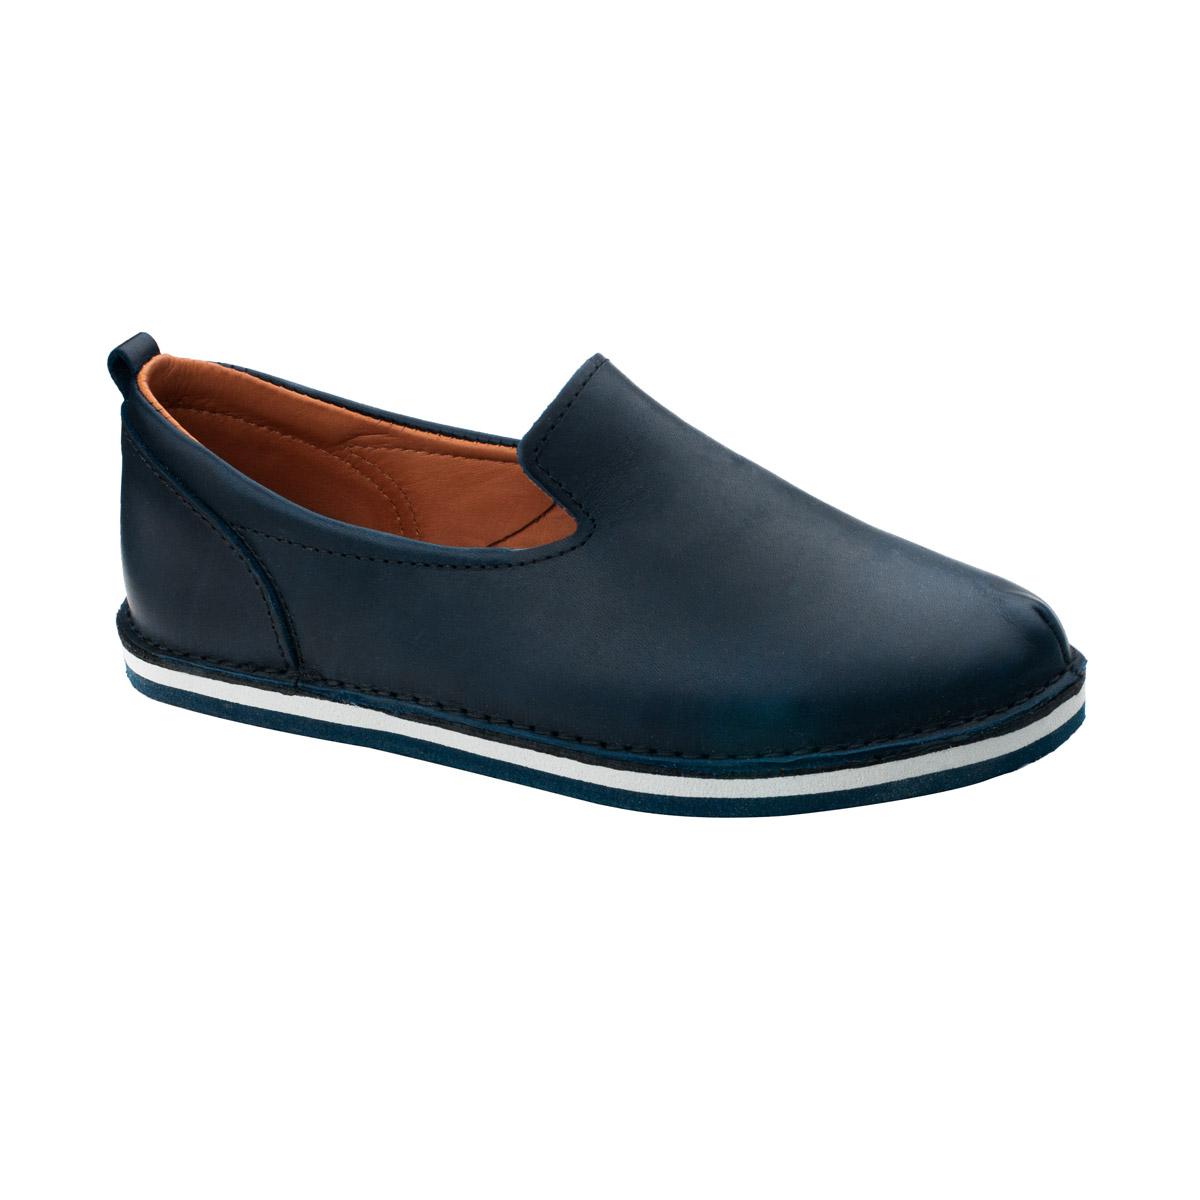 Toku handmade leather loafers